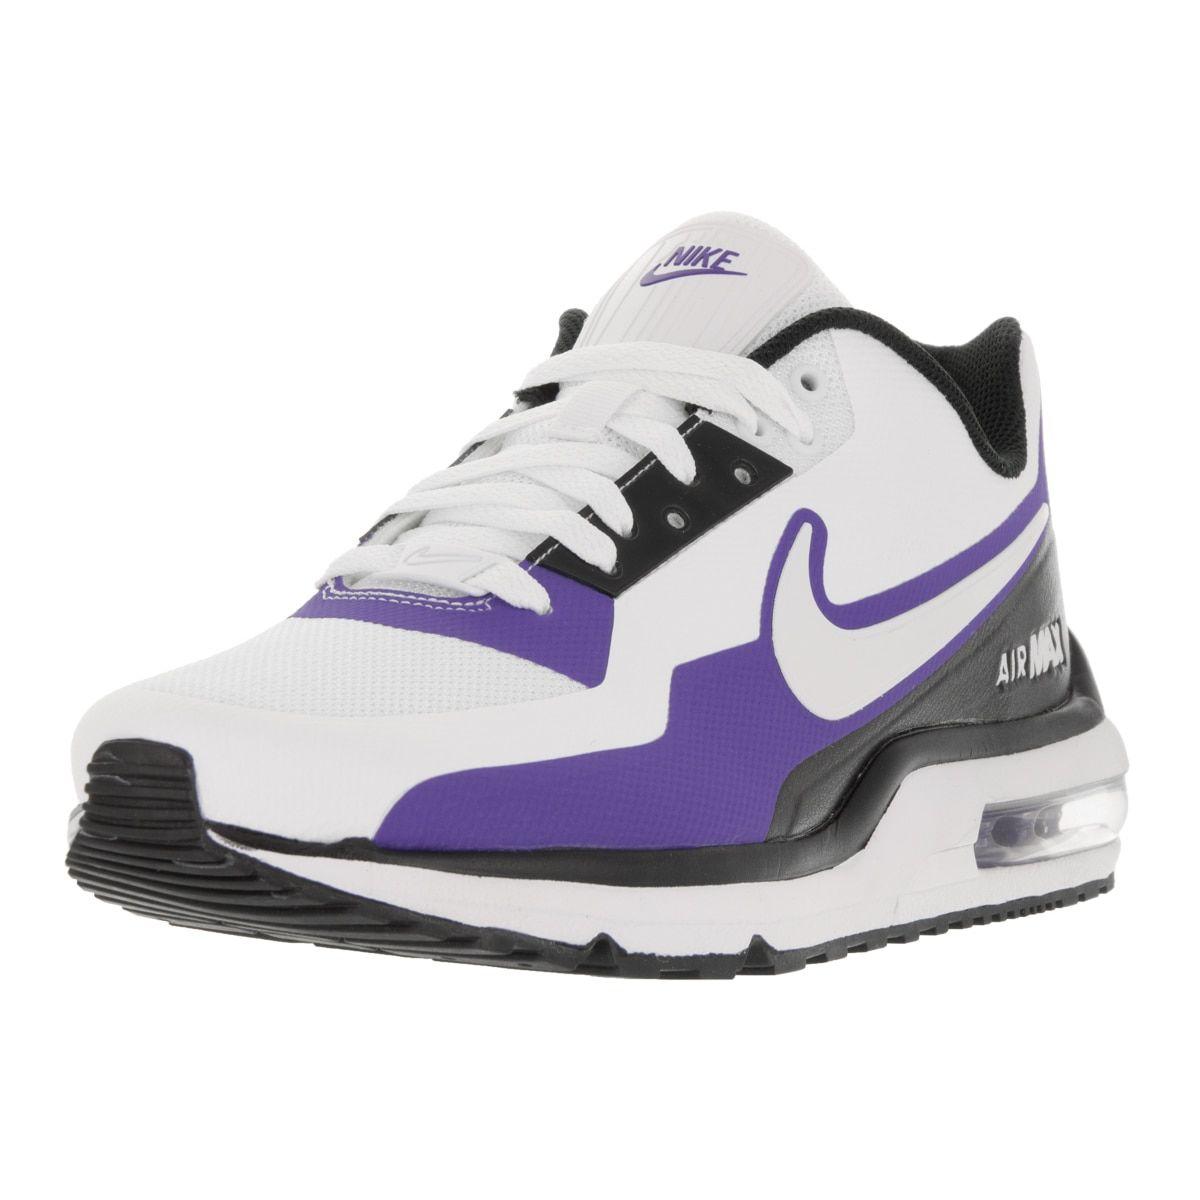 outlet store a3de8 be0f0 Nike Men s Air Max LTD 3 Mod   Black Prsn Violet Running Shoe